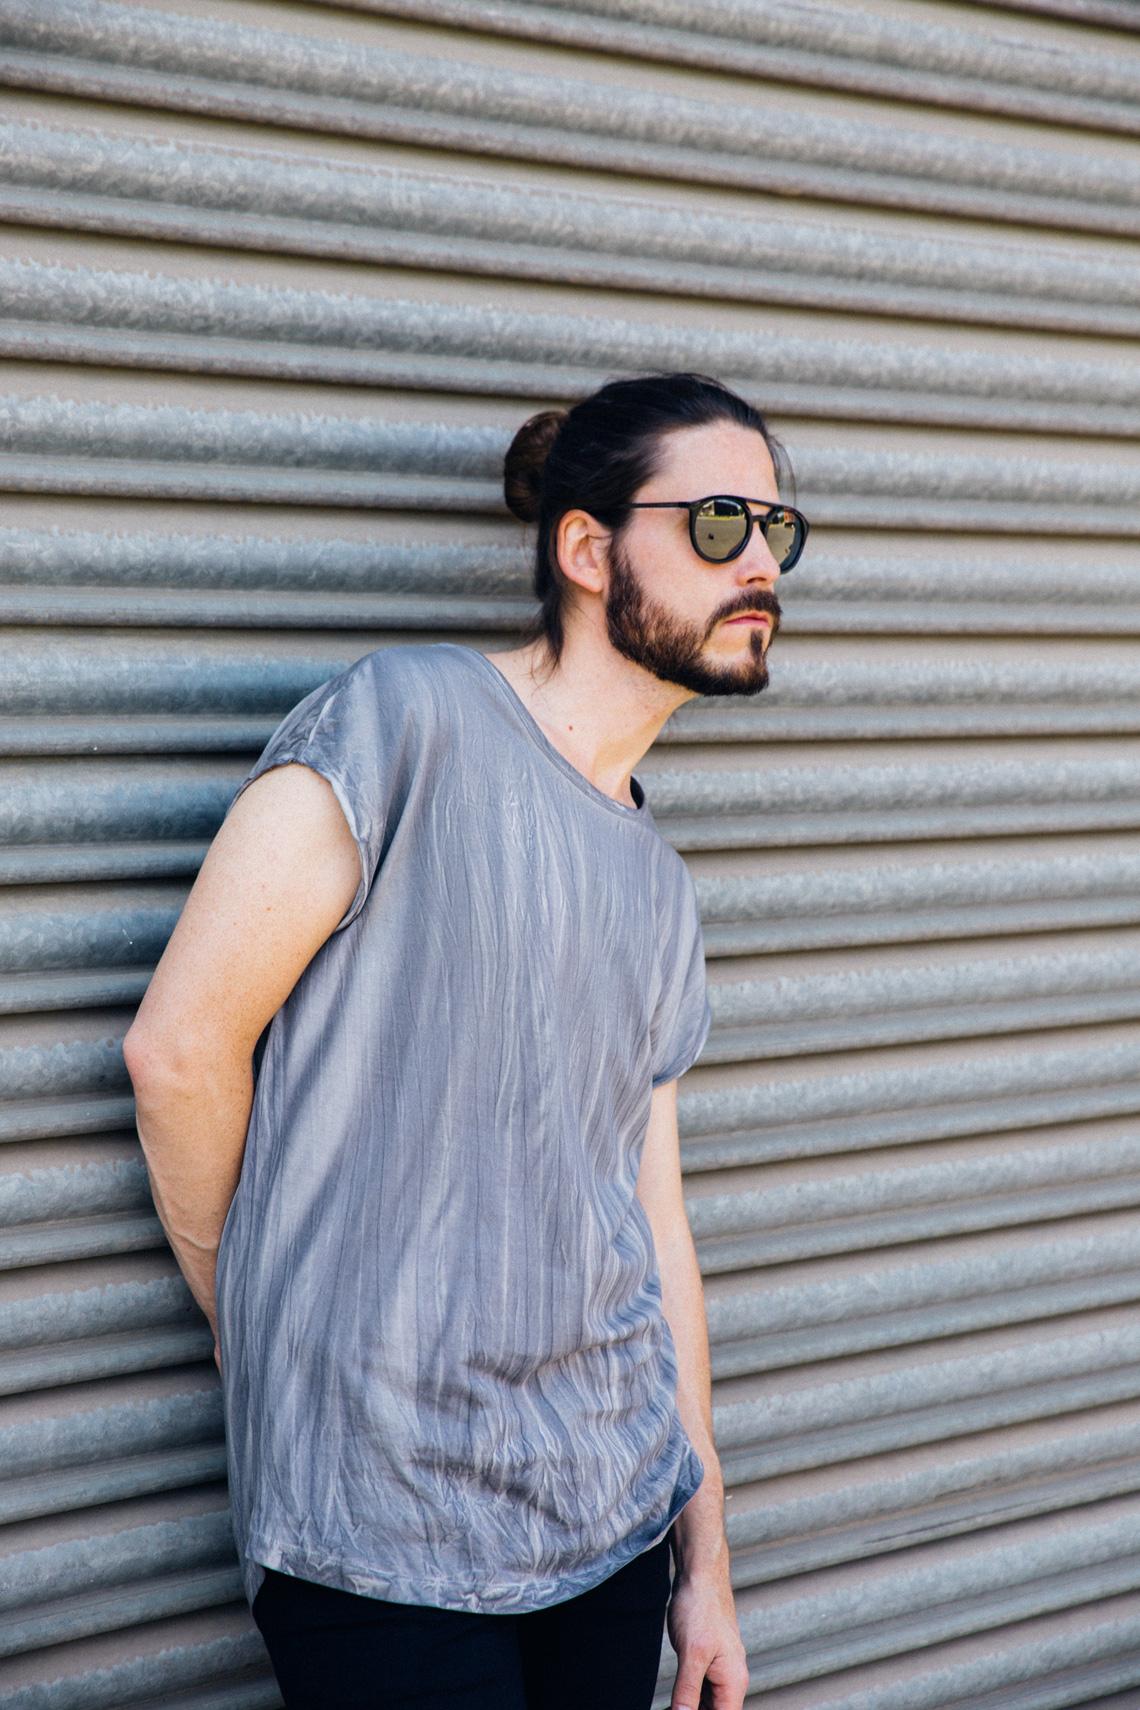 Kaisers-neue-kleider_Maennermodeblog_Male-Fashion-Style-Blog_Grunge-Outfit_Jeansshort_Docs_Fruehlingslook-Rockstar-Attitude